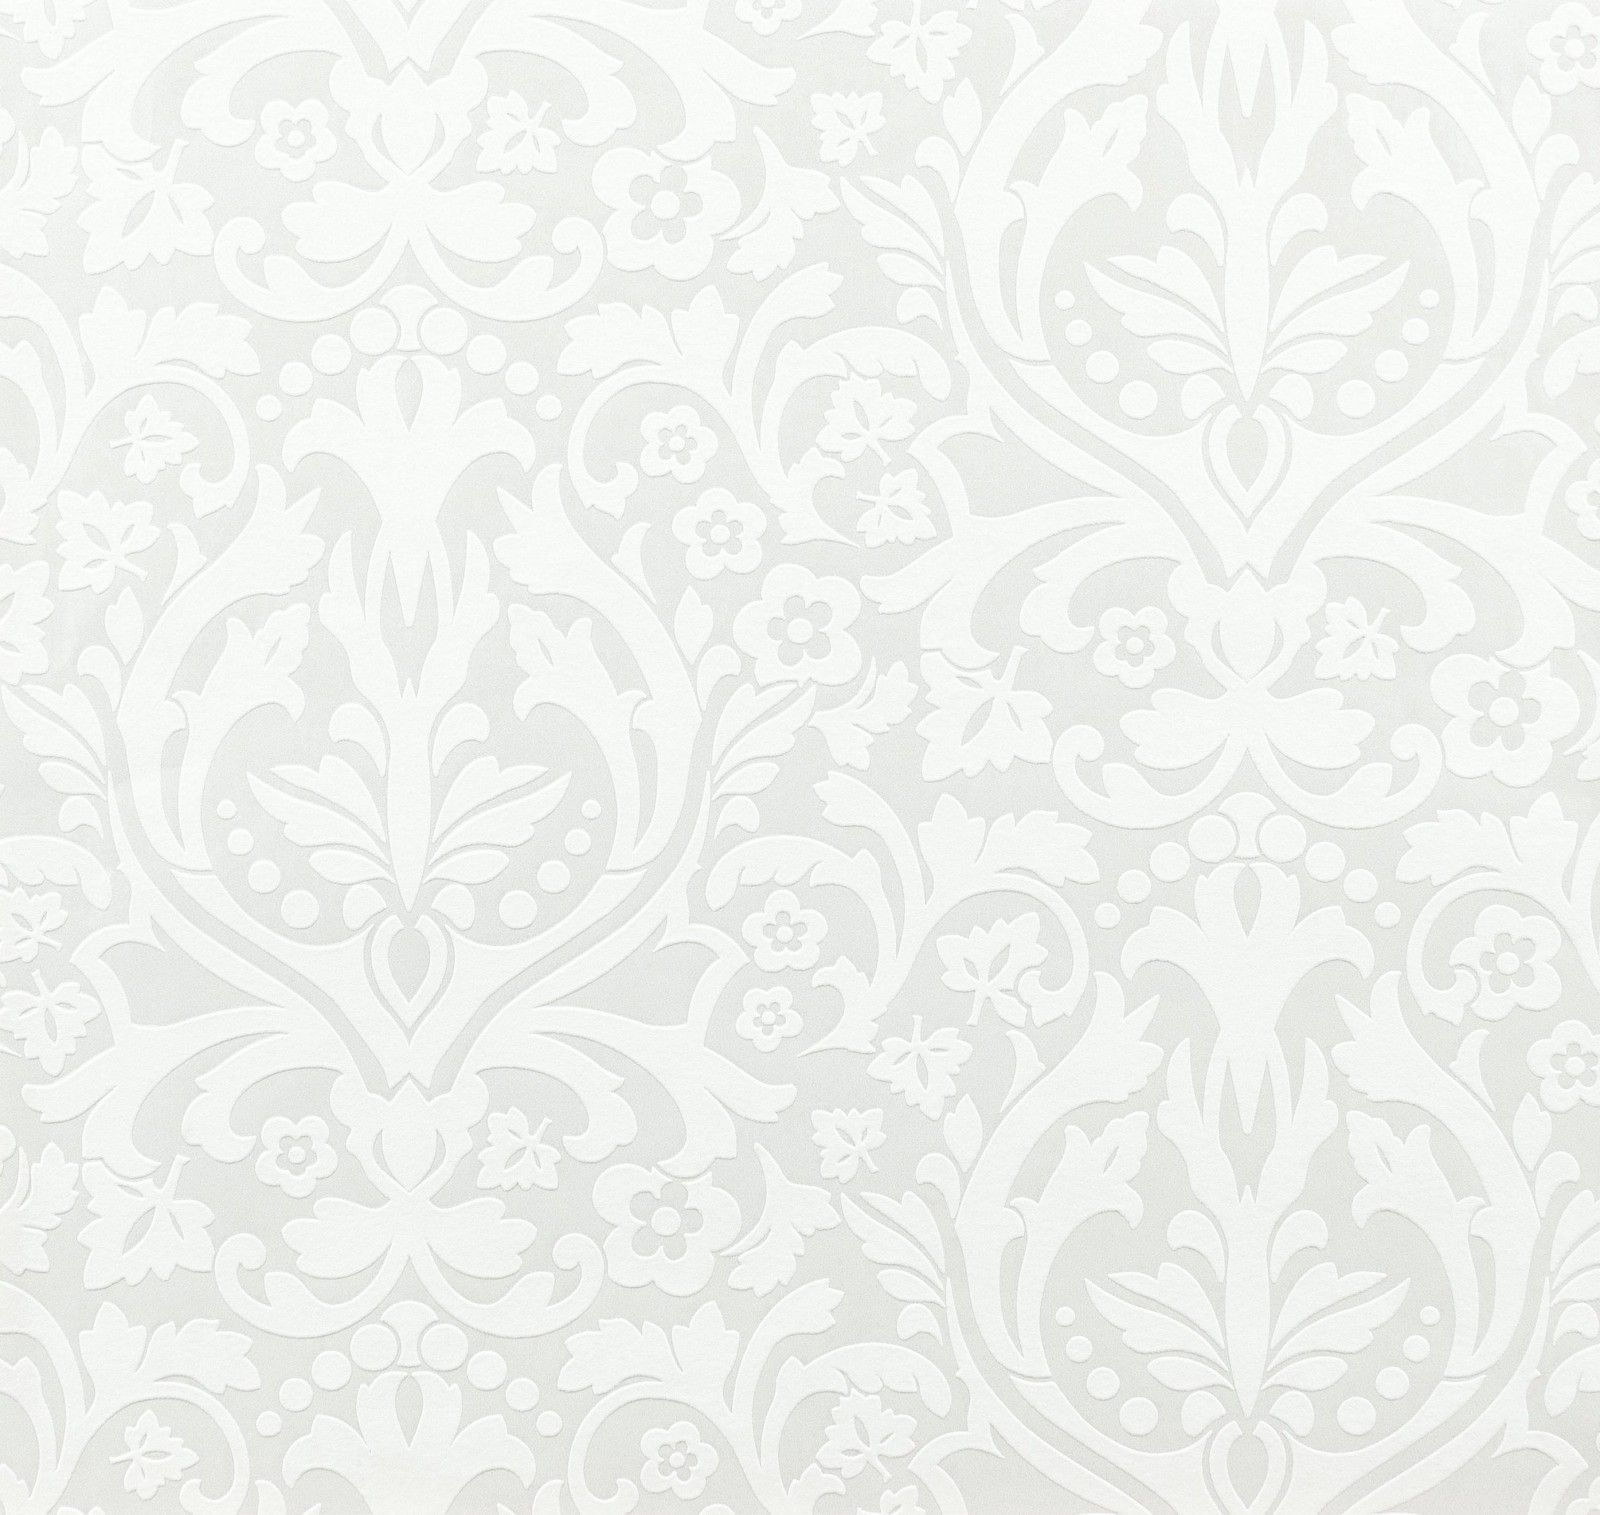 billig tapeten wei mit muster deutsche deko pinterest. Black Bedroom Furniture Sets. Home Design Ideas